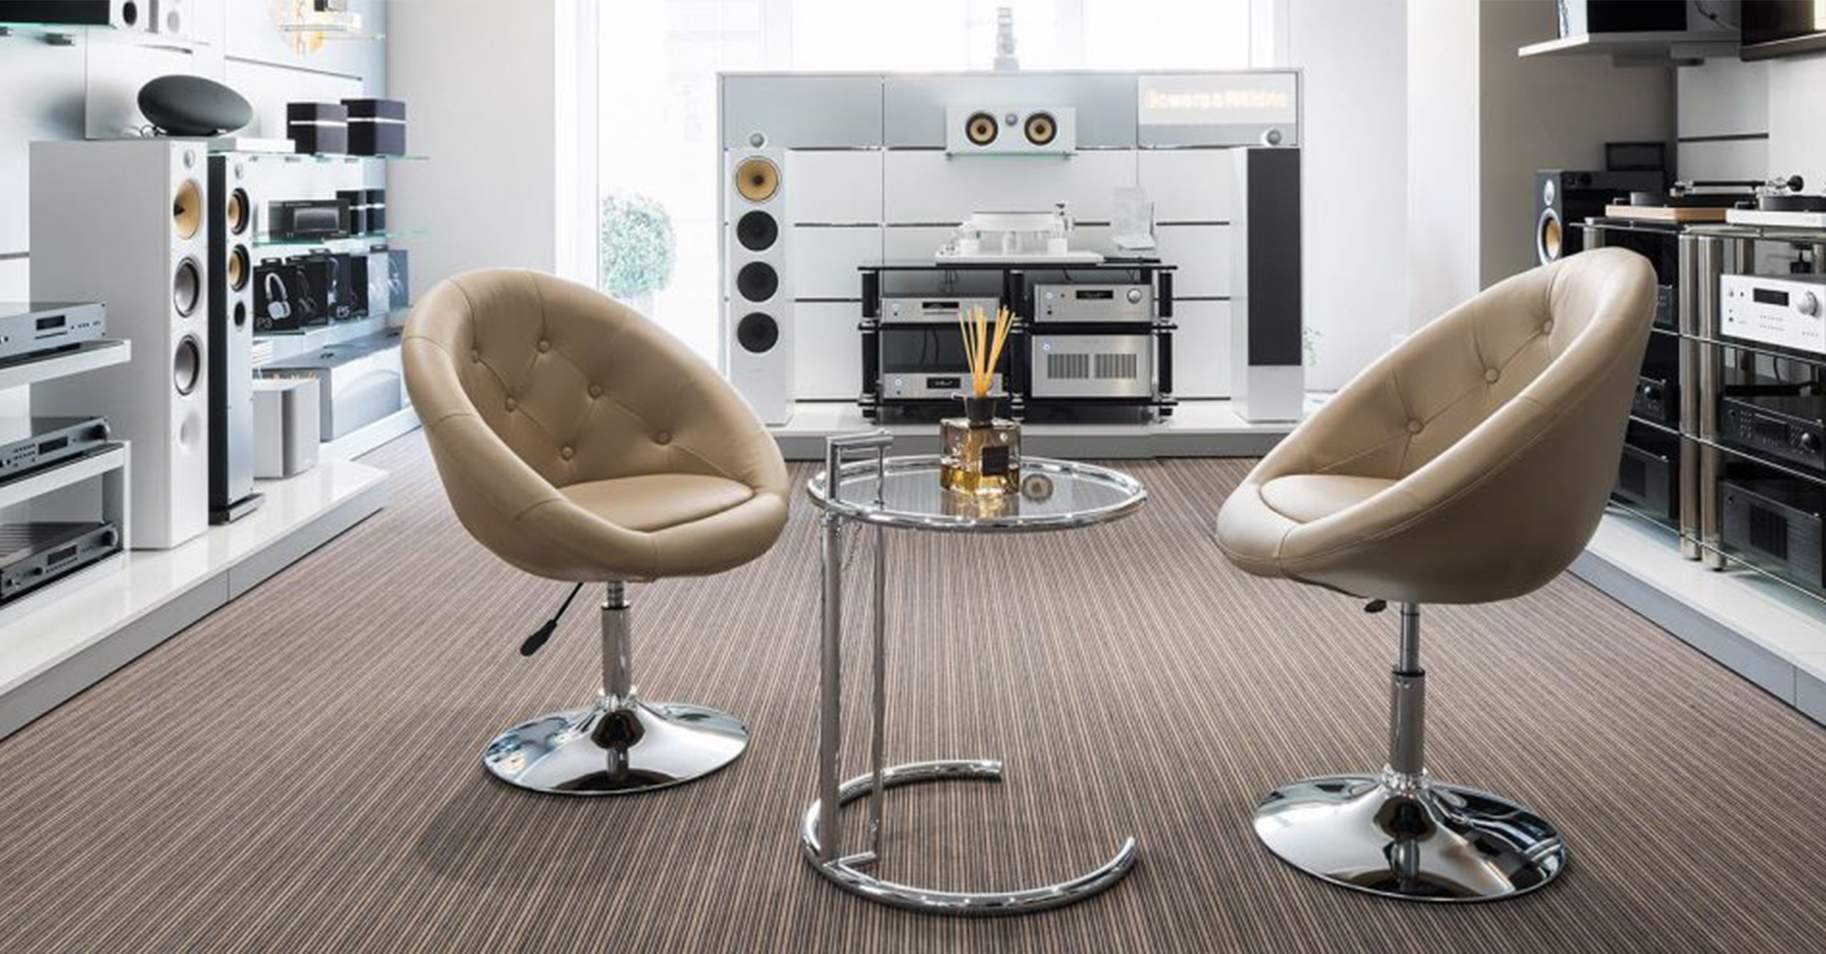 Home Entertainment Concept Store